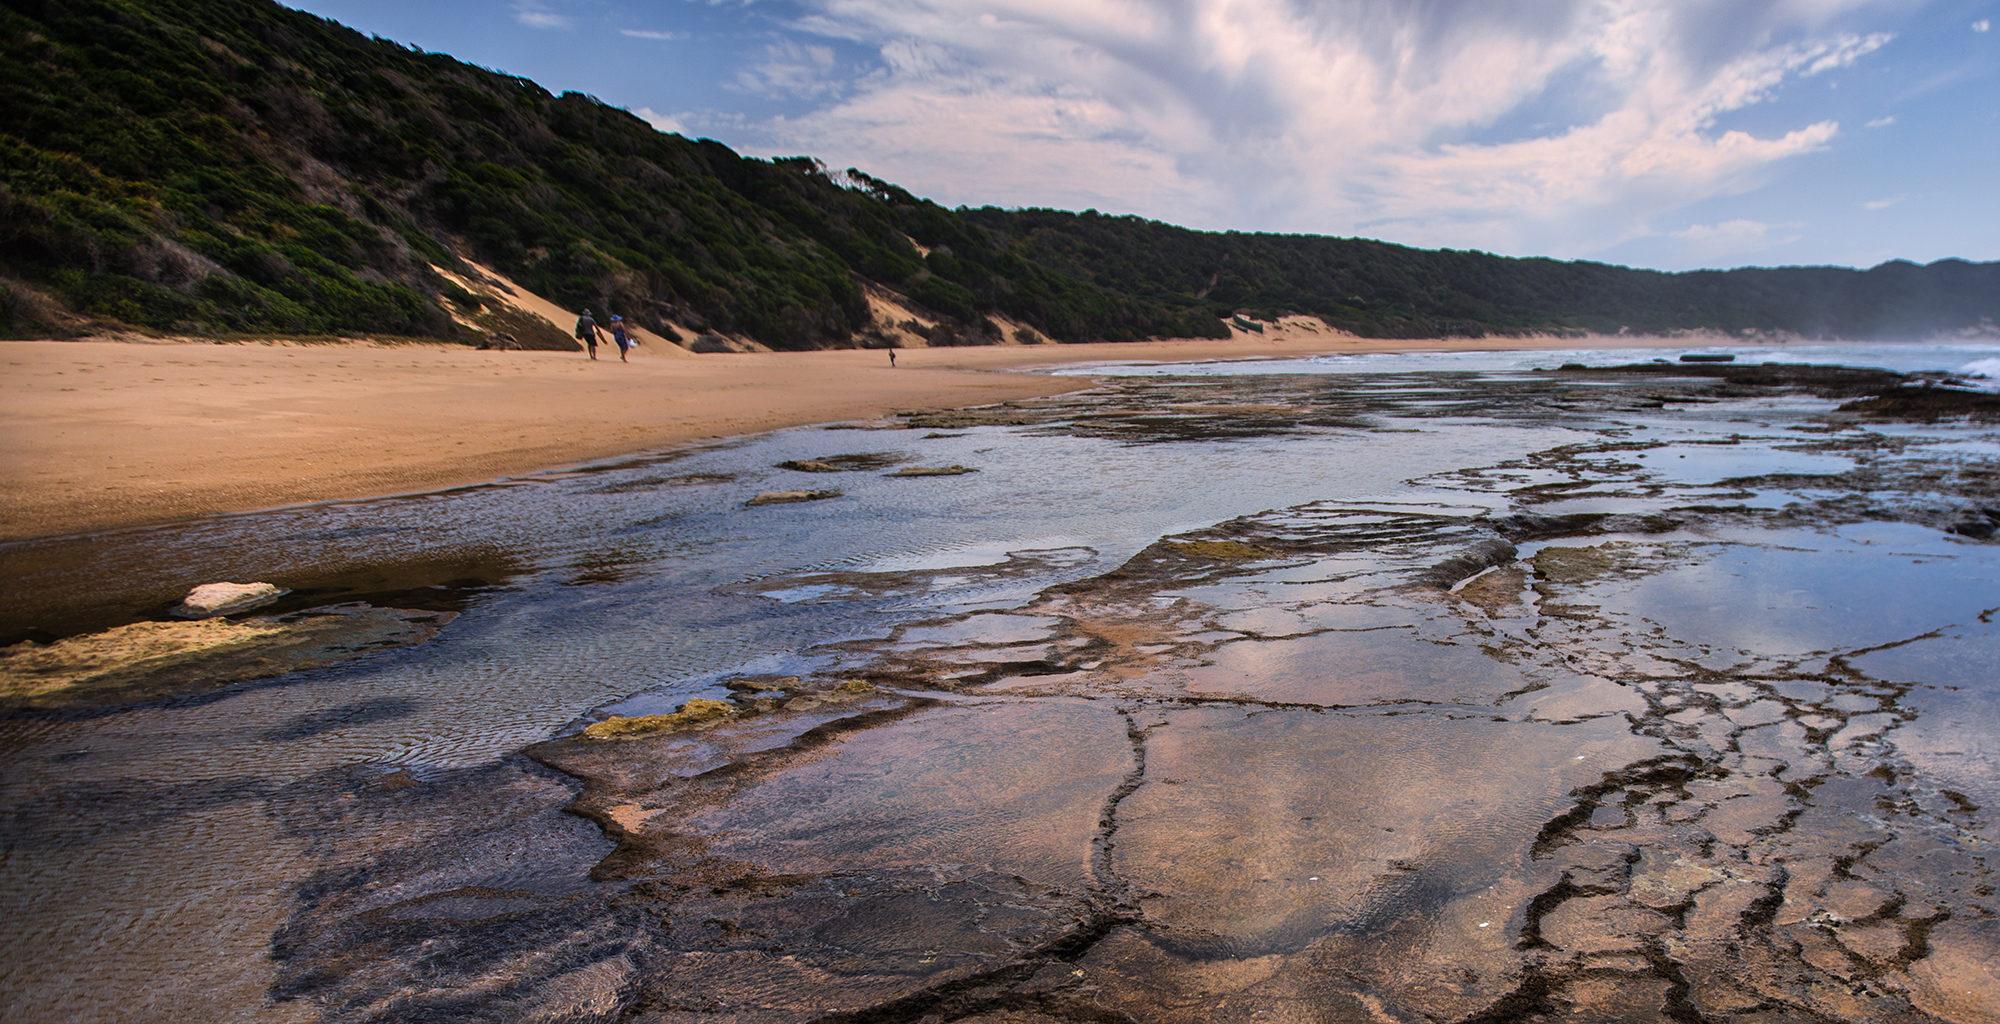 South-Africa-KwaZulu-Natal-Beach